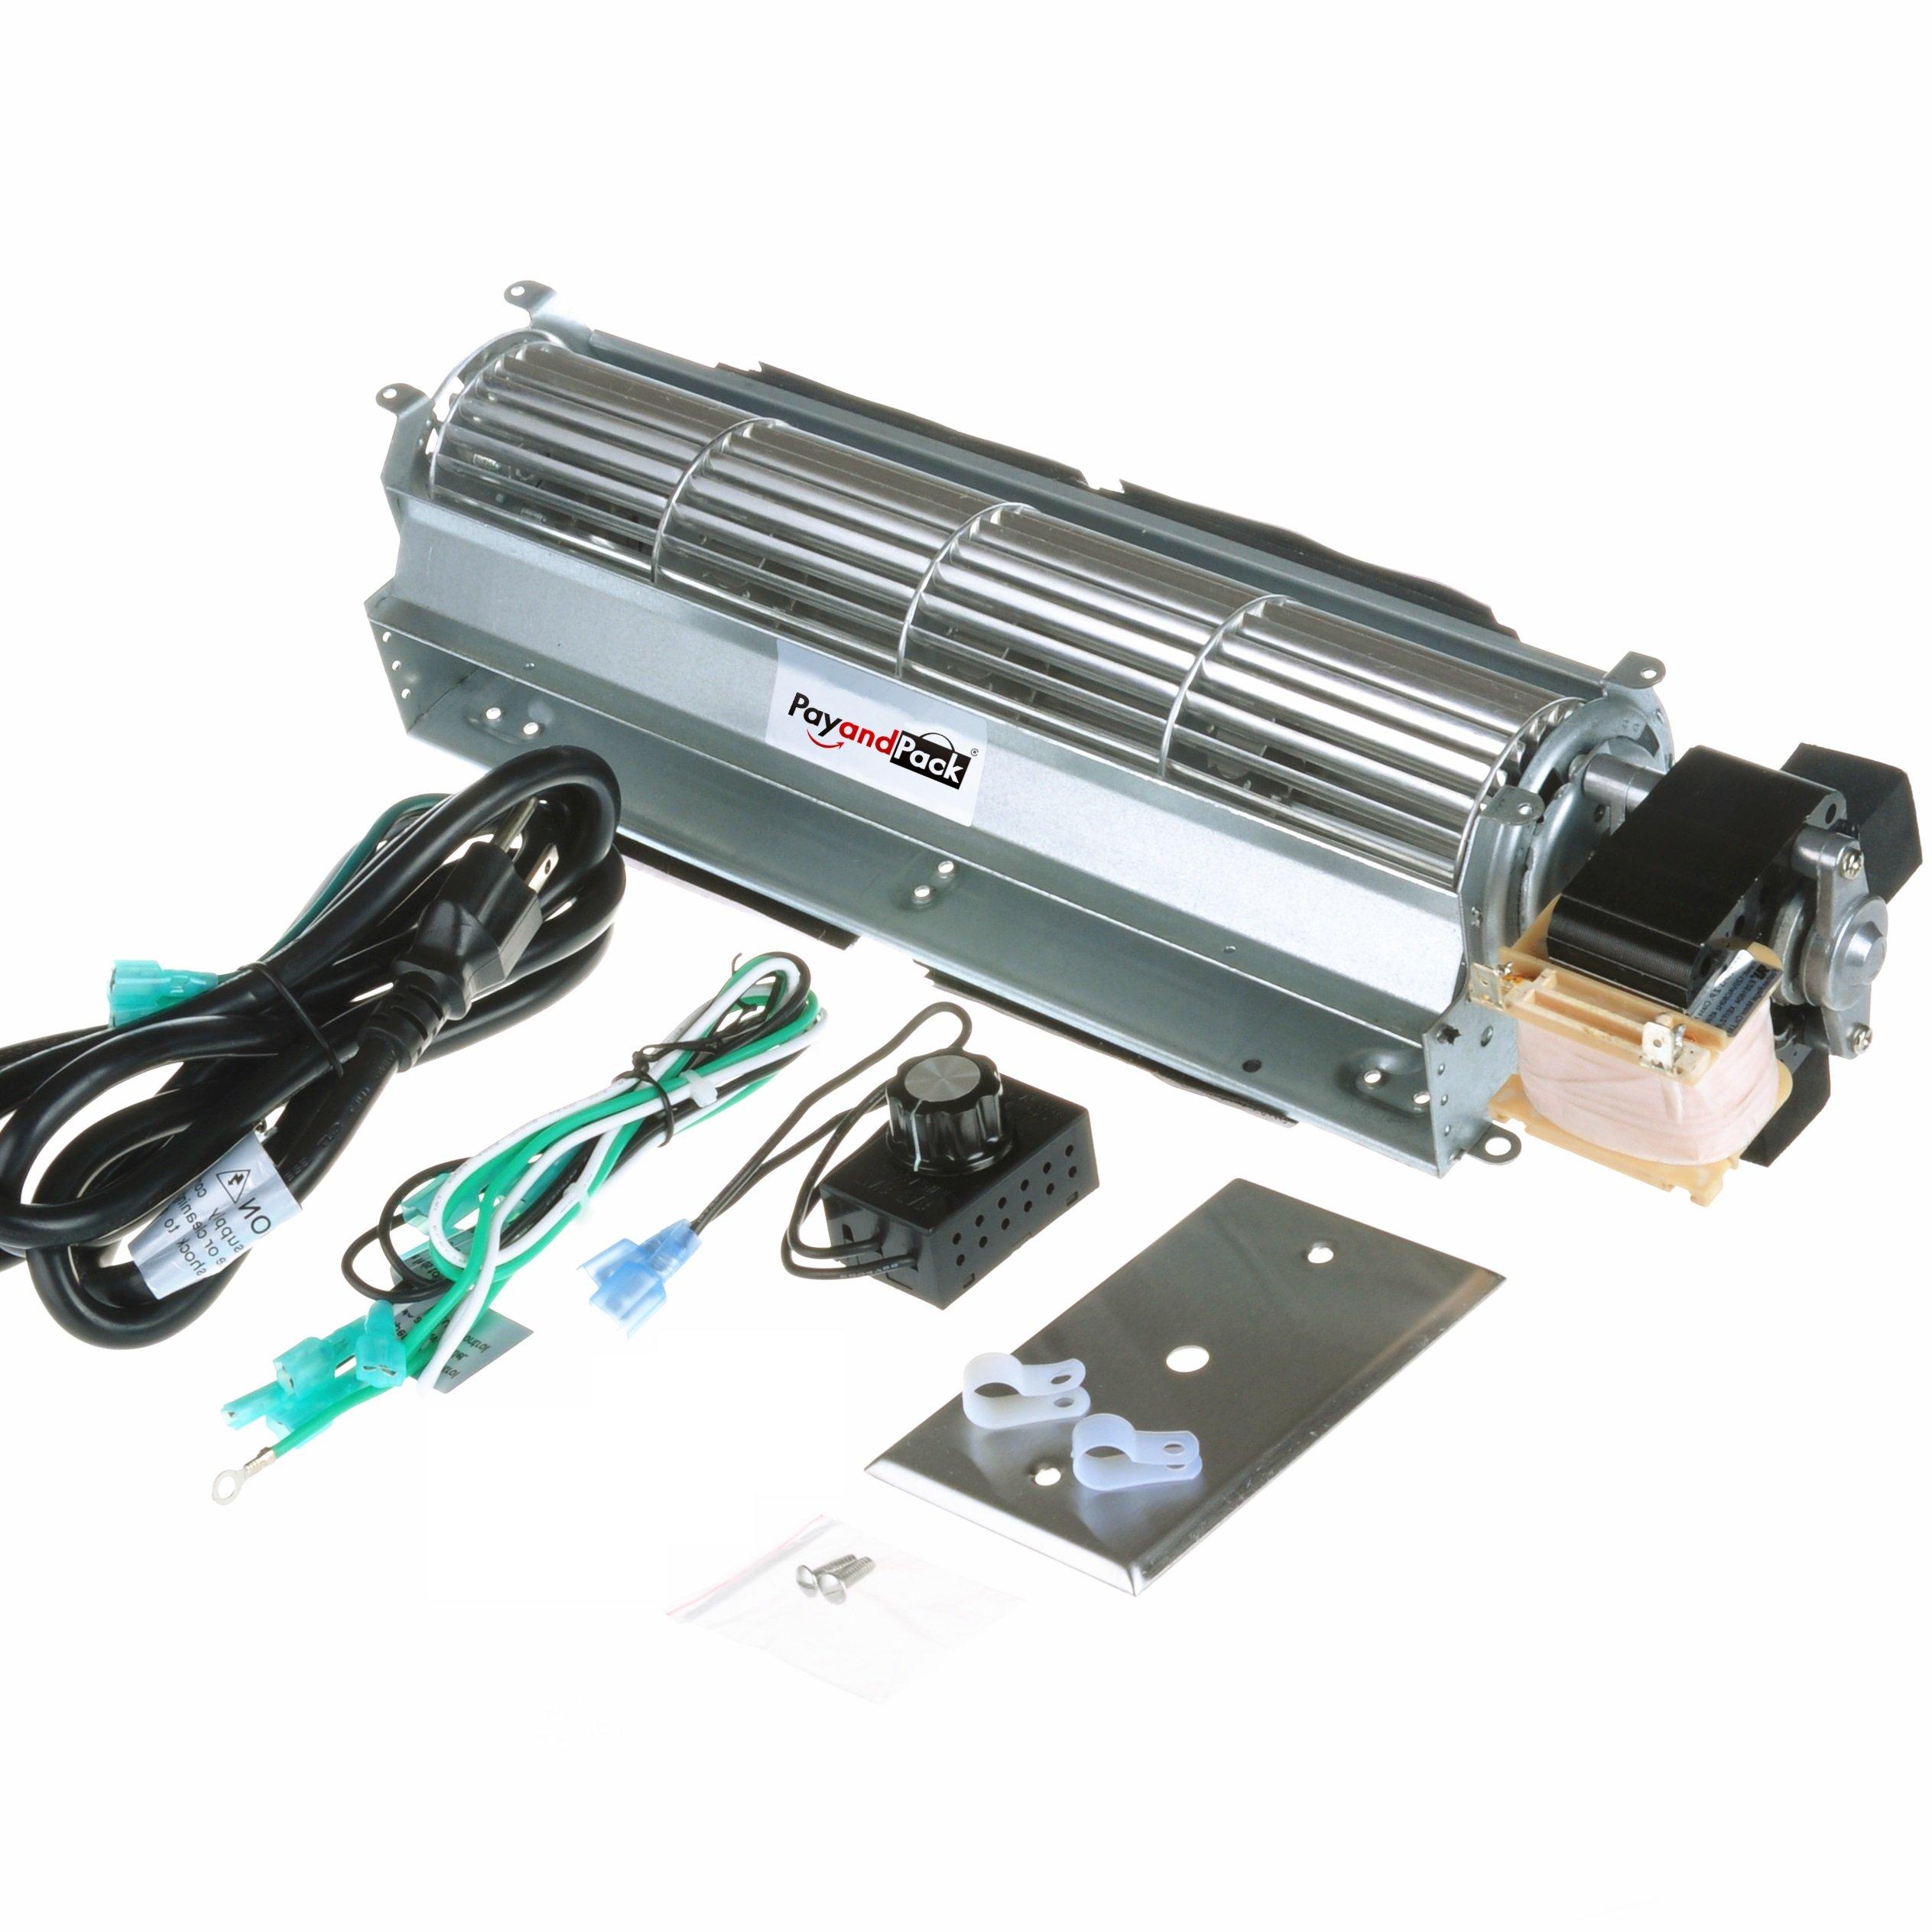 Durablow BK BKT GA3650 GA3700 GA3750 Replacment Fireplace Blower Fan Unit for Desa, FMI, Vanguard, Vexar, Comfort Flame Glow, Rotom ... (MFB010-A) by Durablow